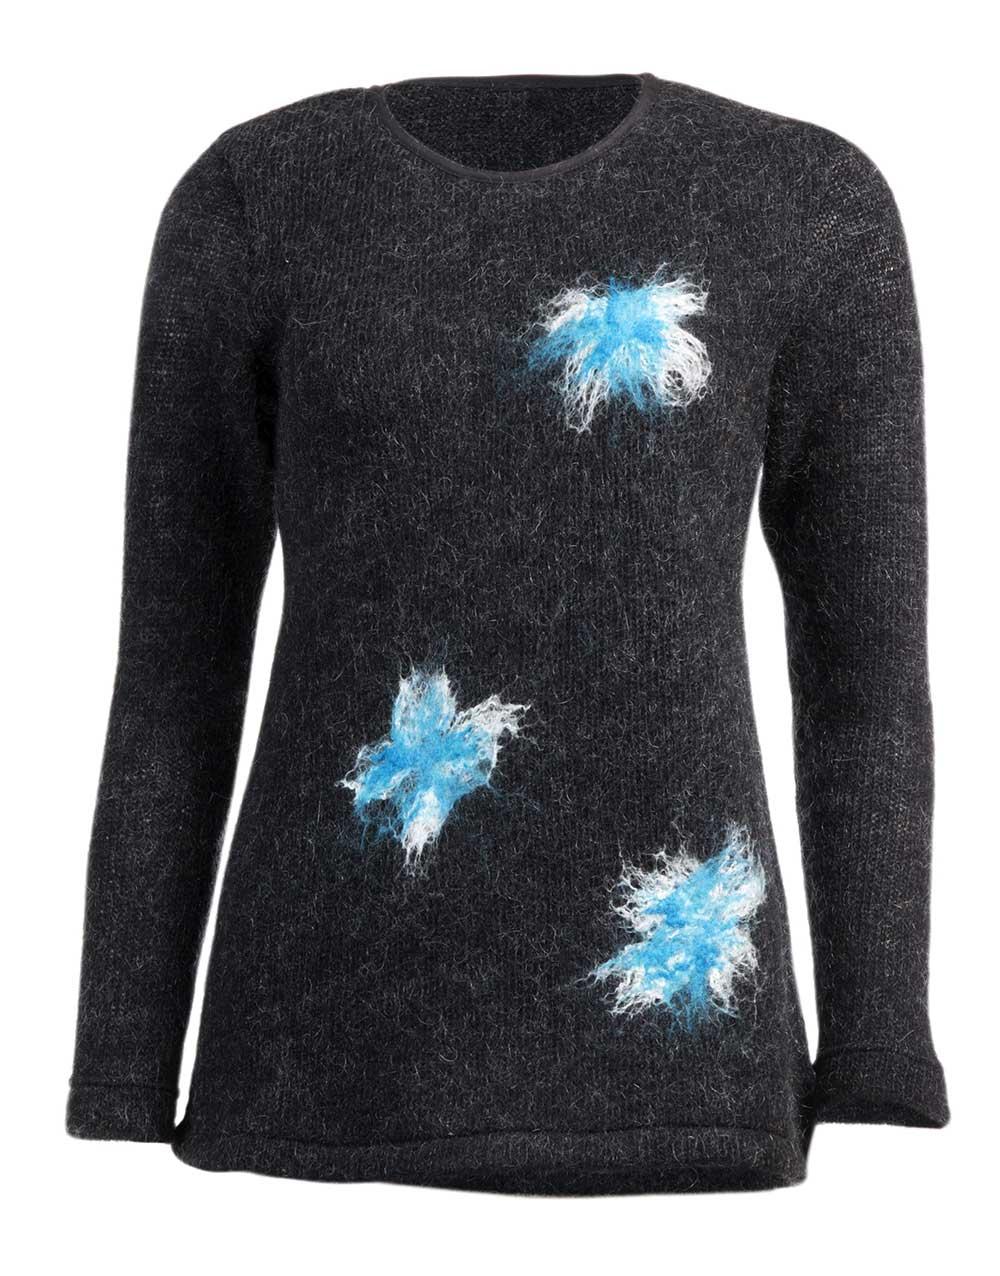 glacier slim sweater, gjoska design